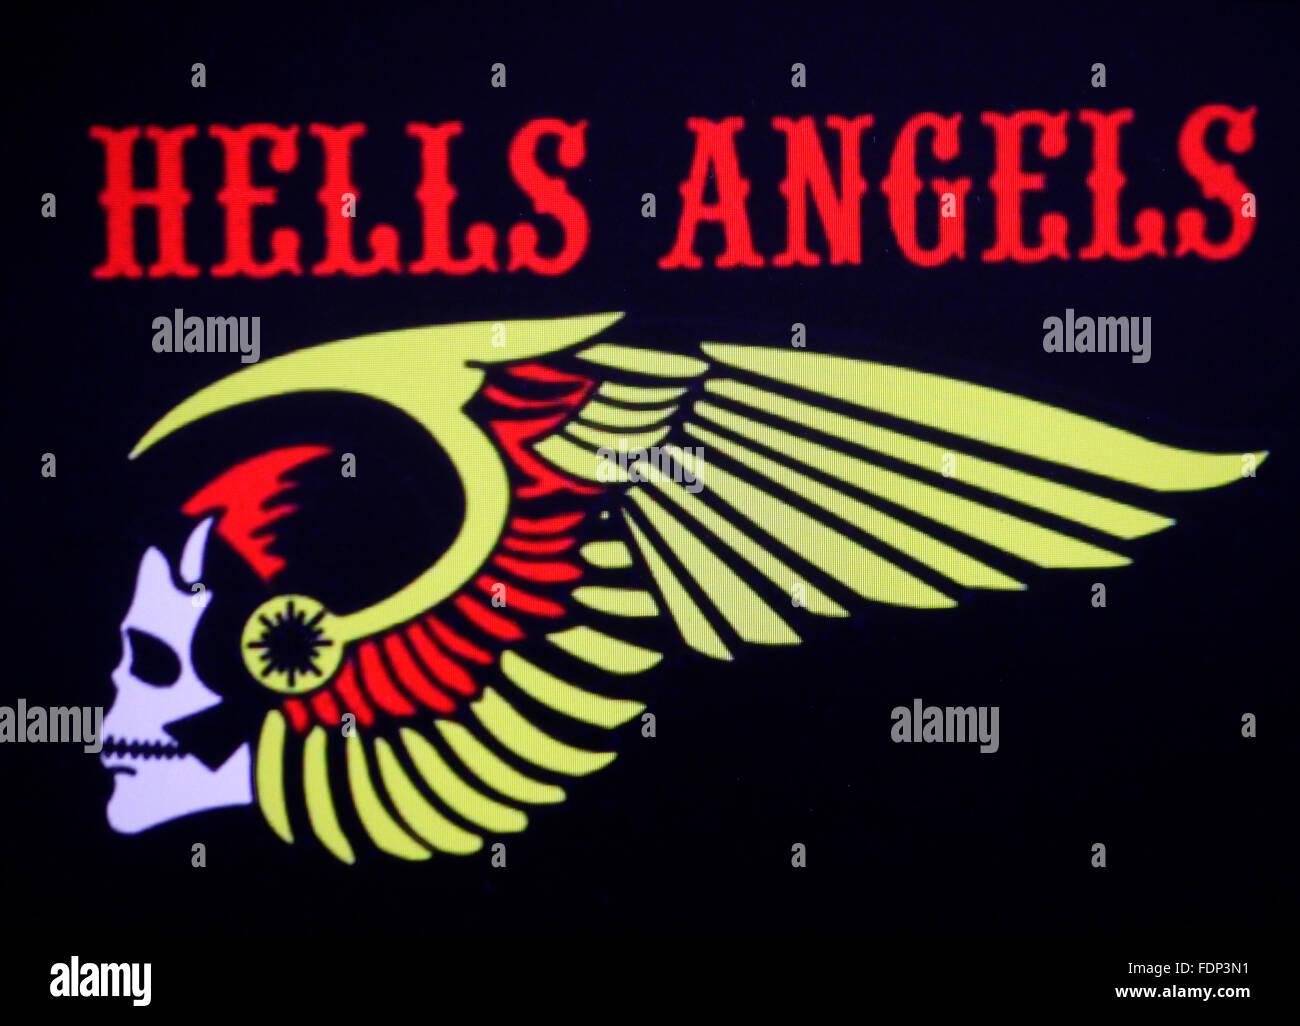 Hells Stock Photos & Hells Stock Images - Alamy